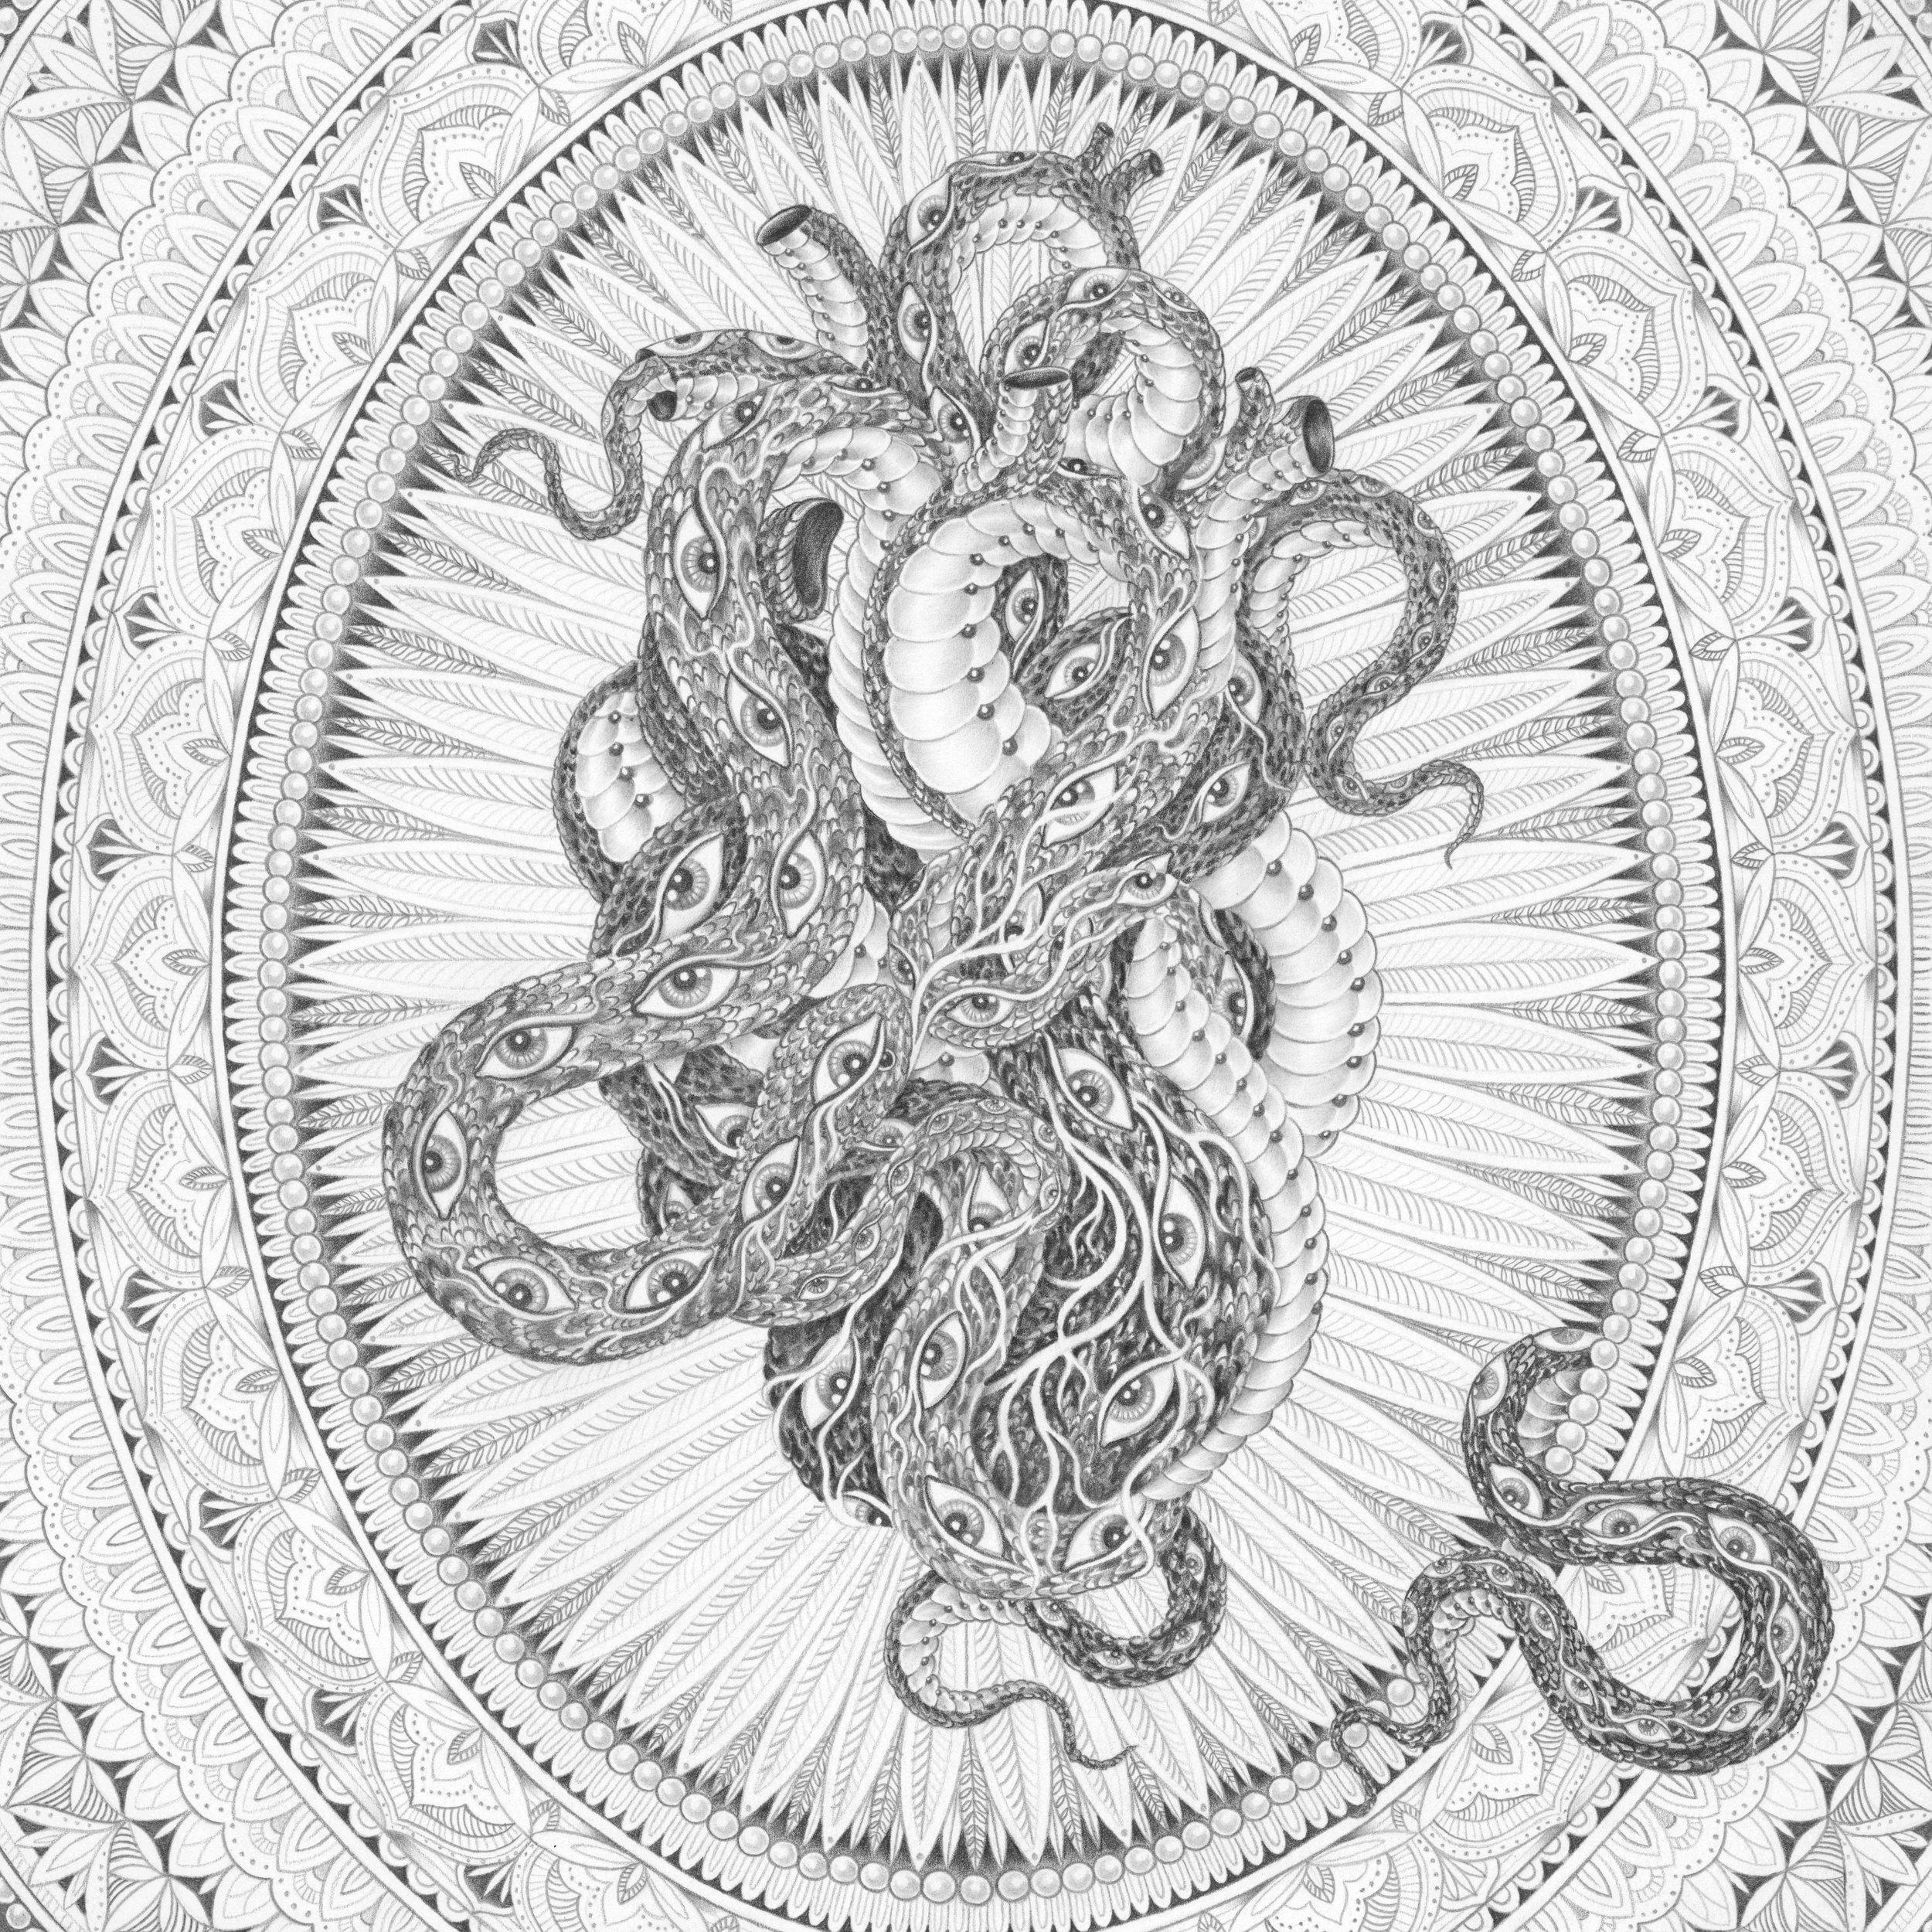 SAIRA HUNJAN - EXPLORE THE COLLECTION